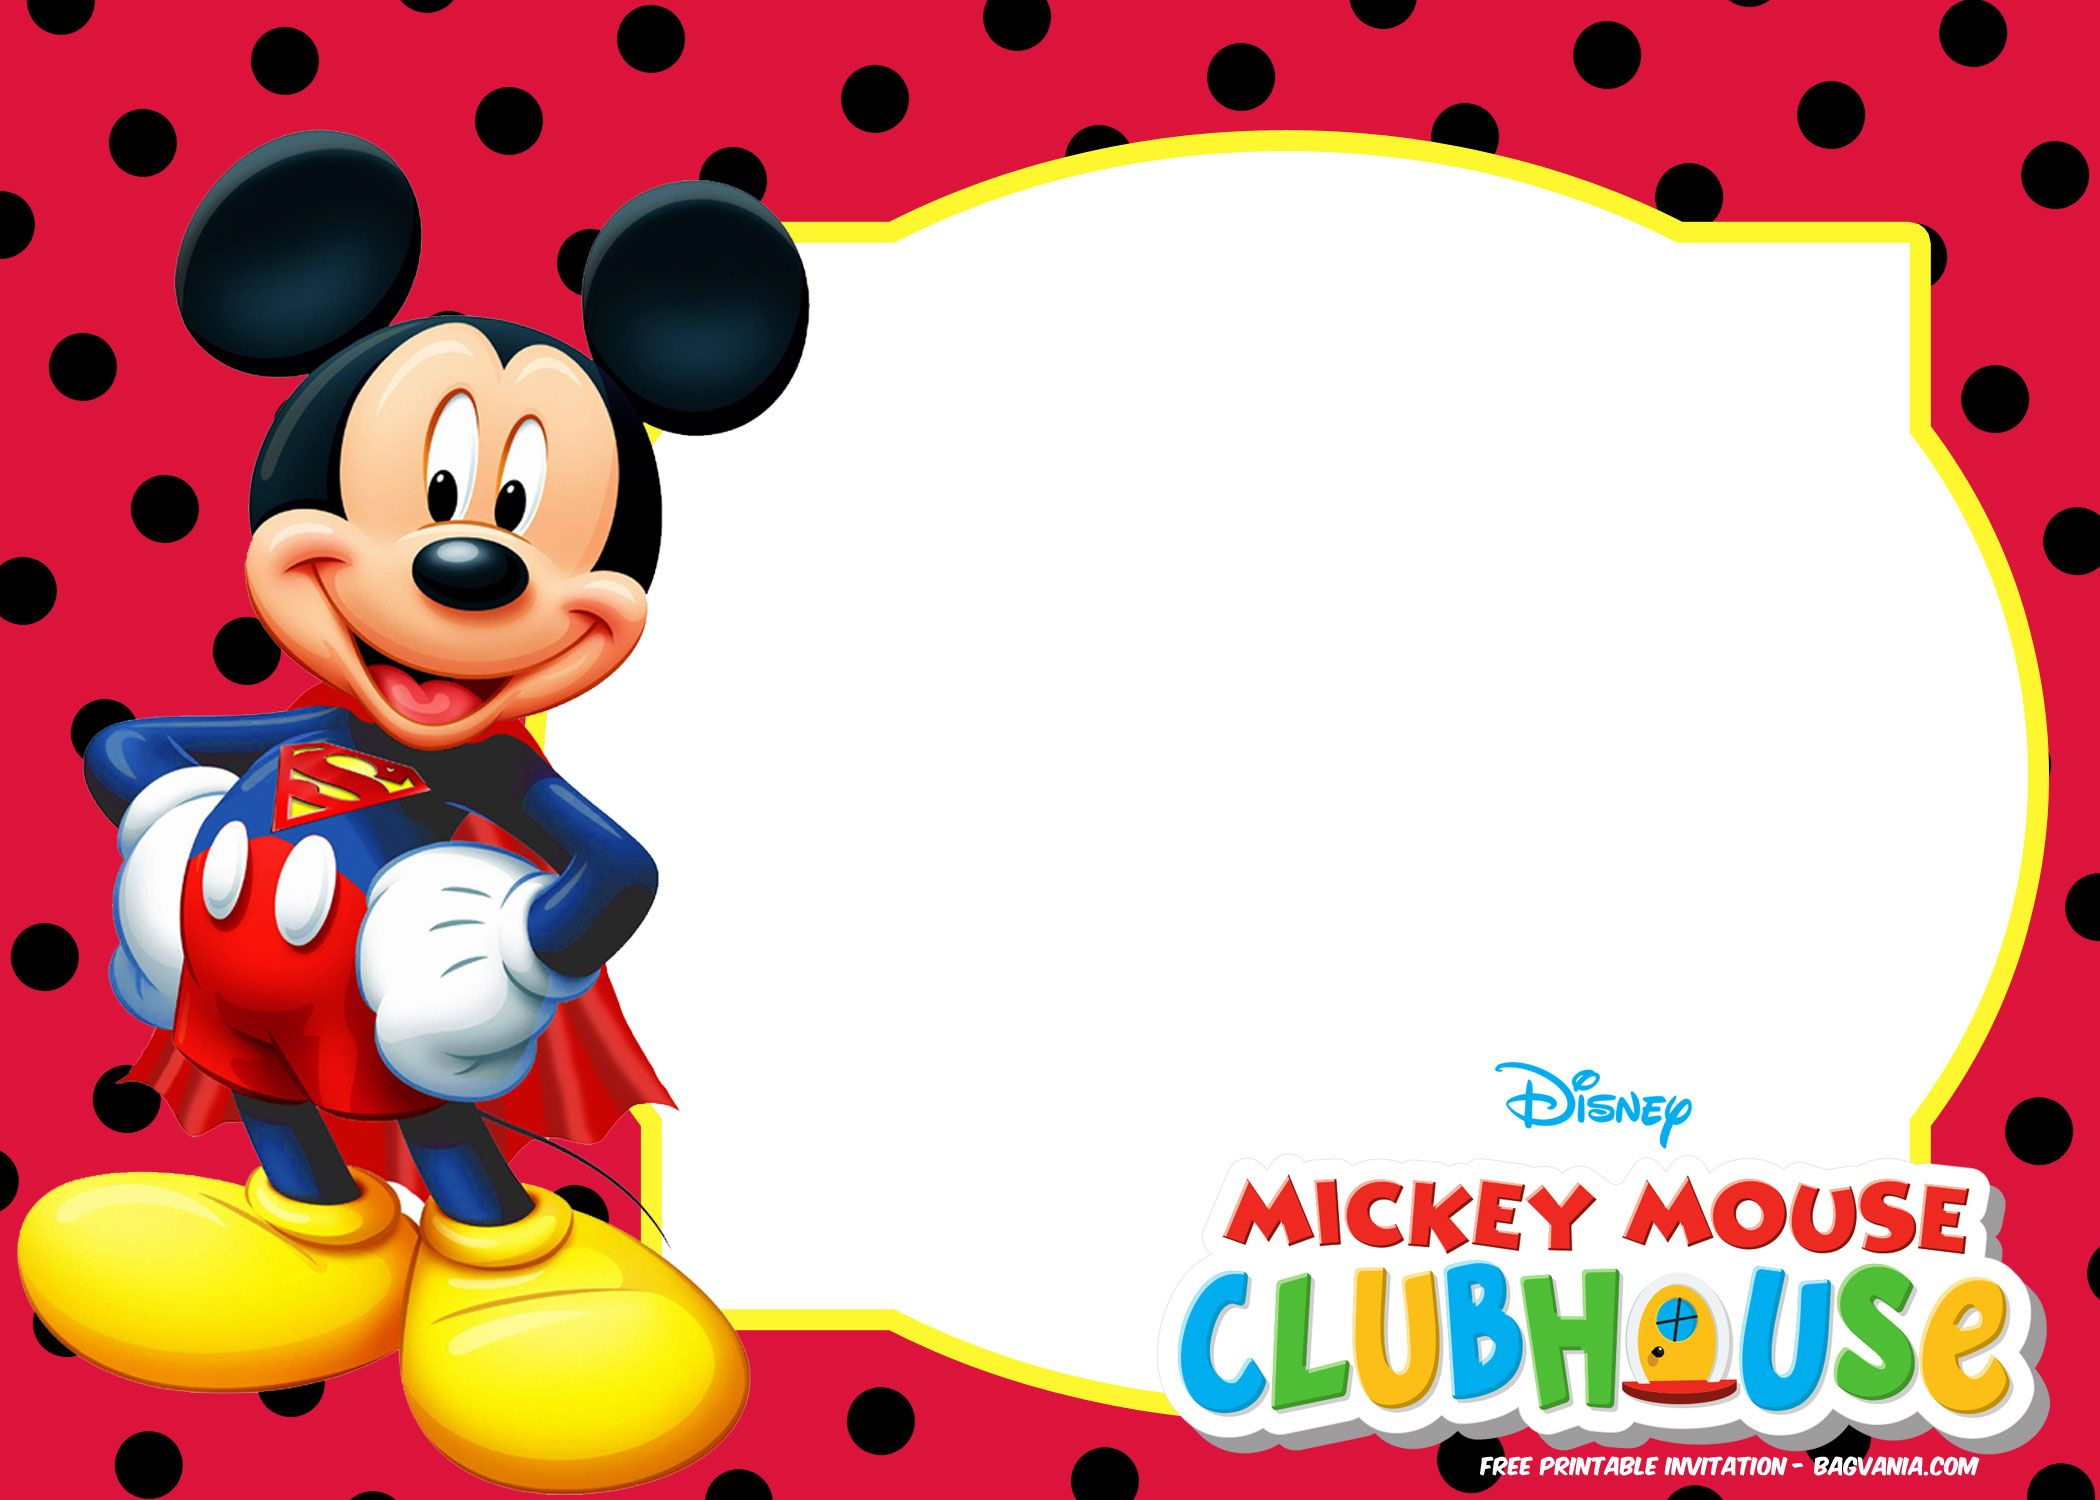 Mickey Mouse Polka Dot Invitation Templates | Cards - Sayings - Free Printable Mickey Mouse Invitations